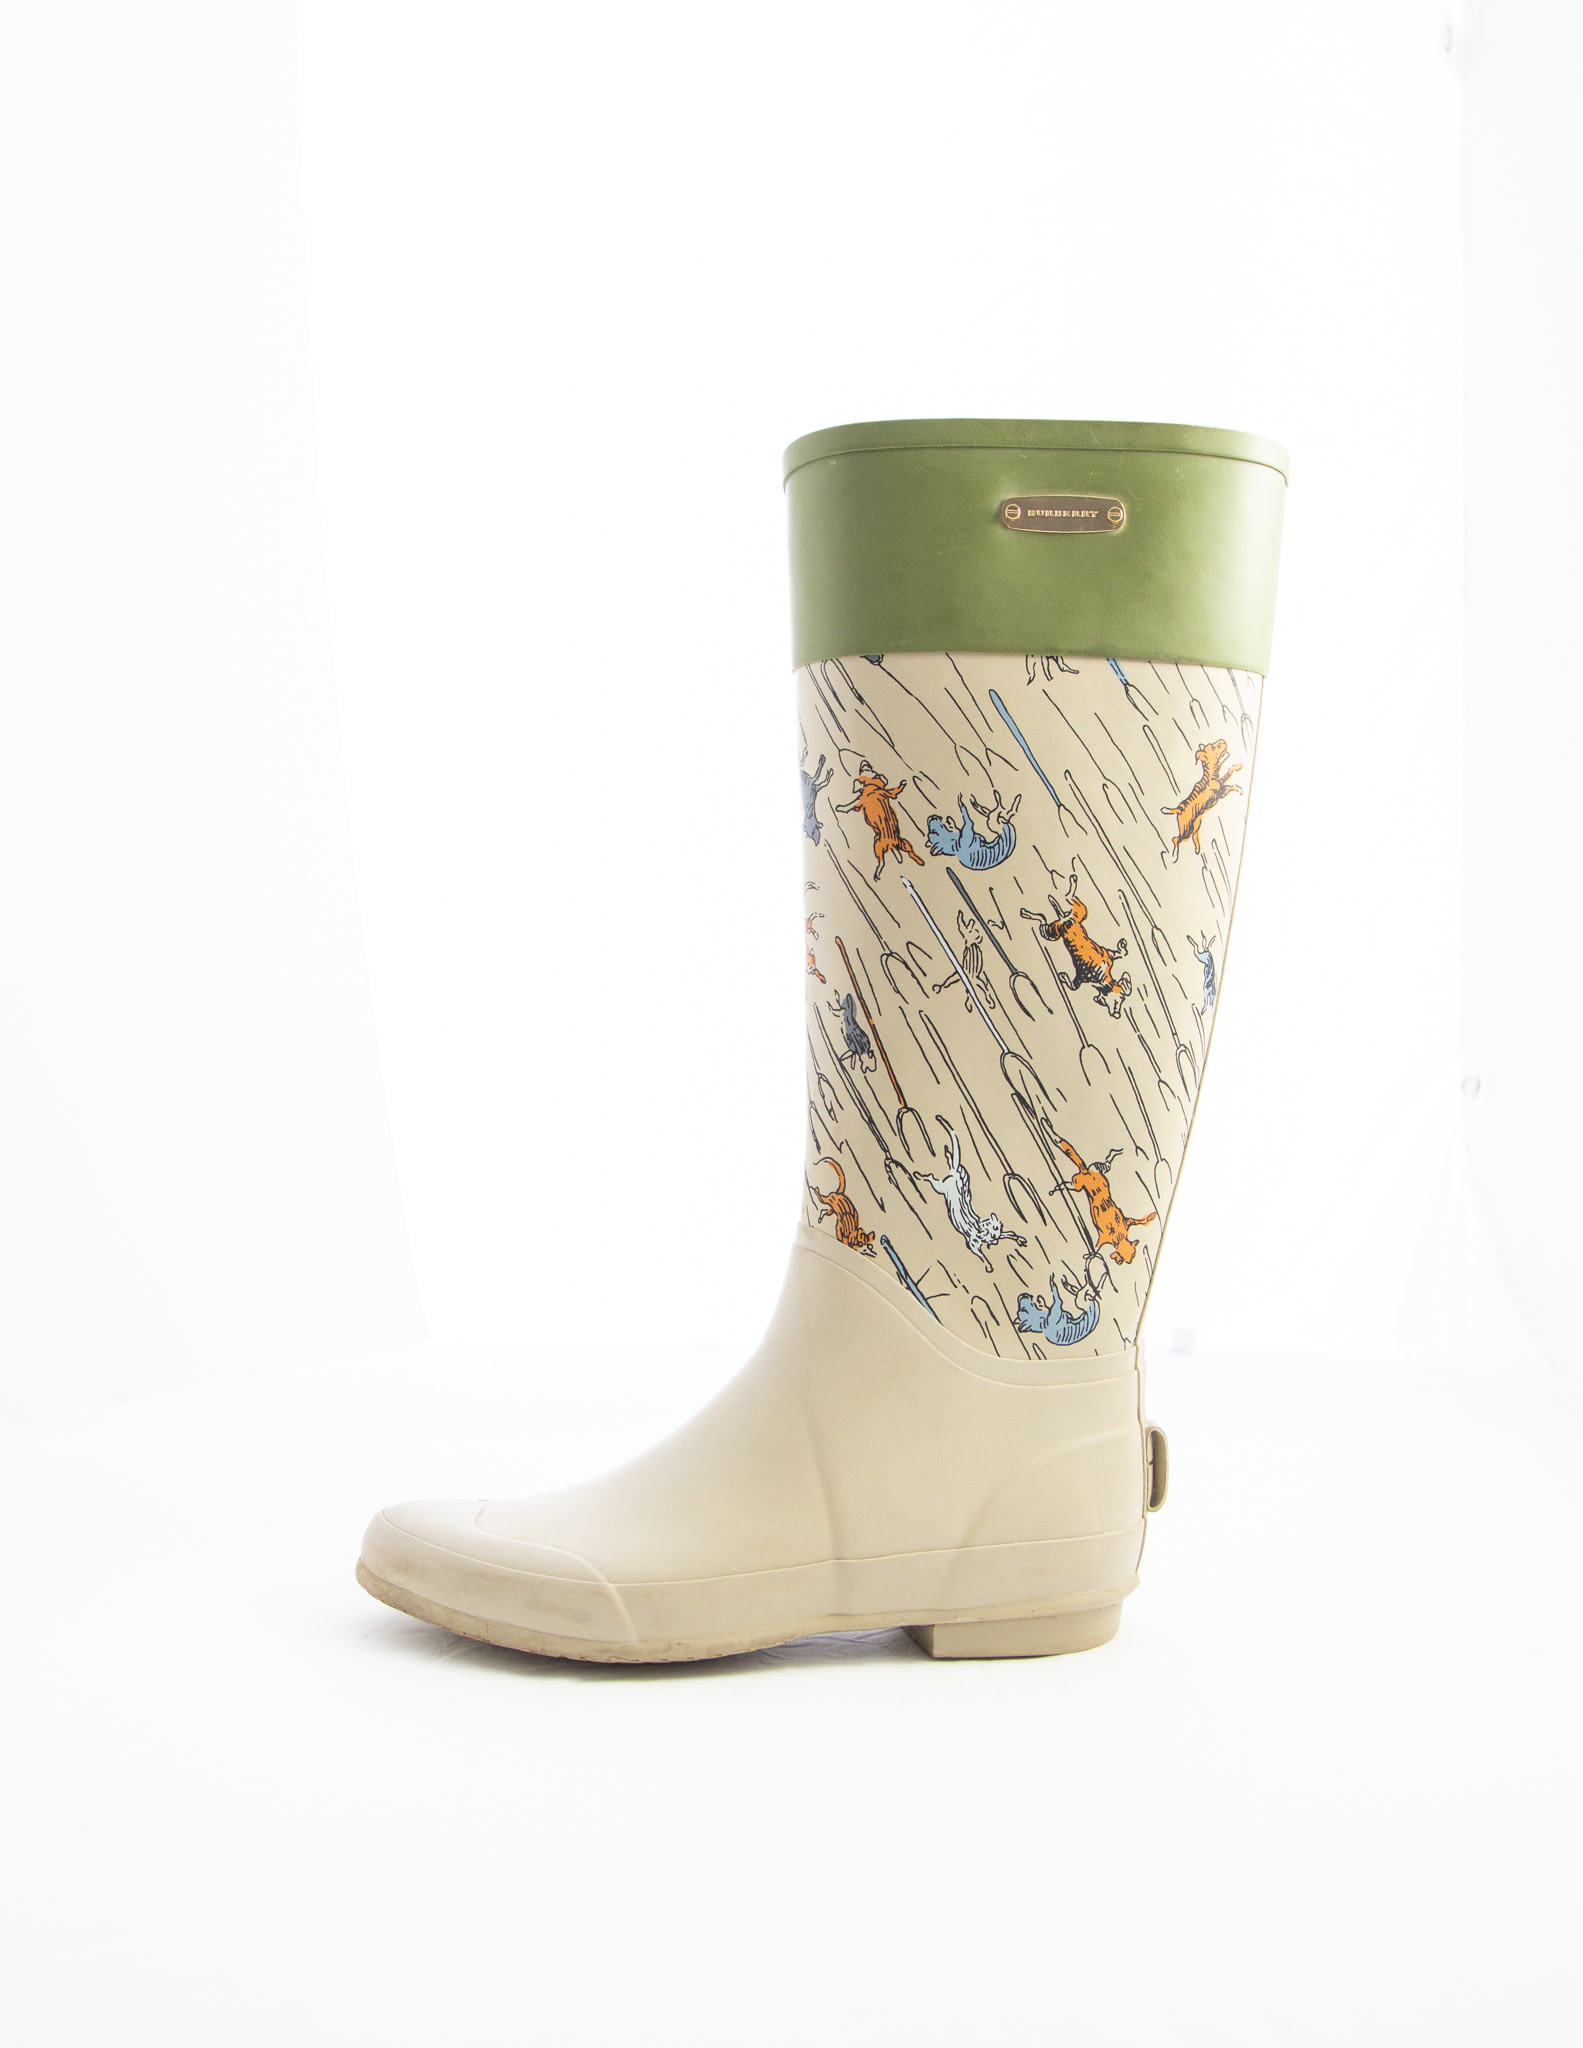 "Burberry ""It's Raining Cats & Dogs"" Rain Boots"